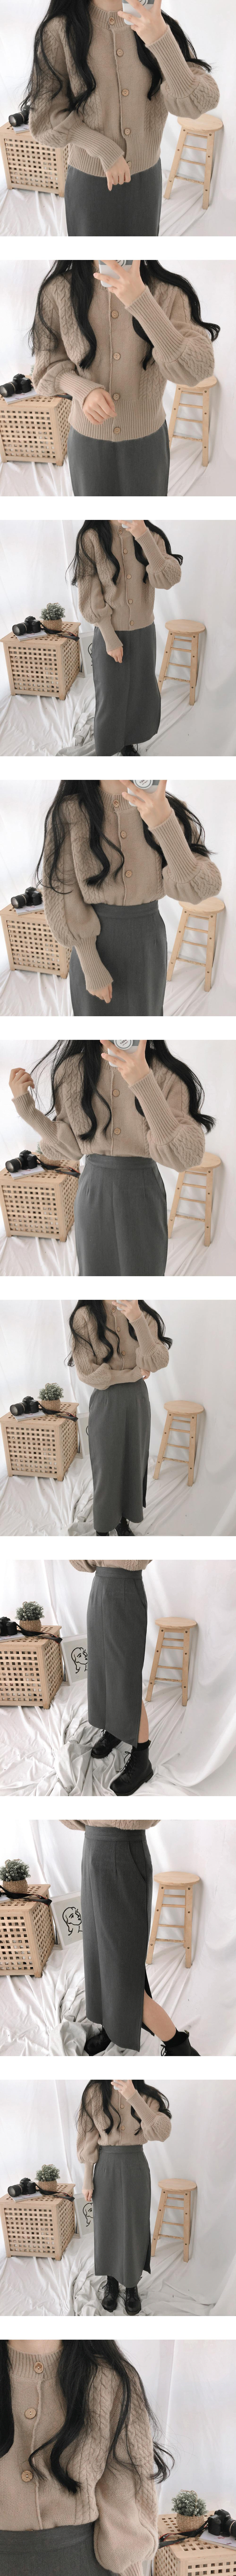 2206 pretzel round knit cardigan